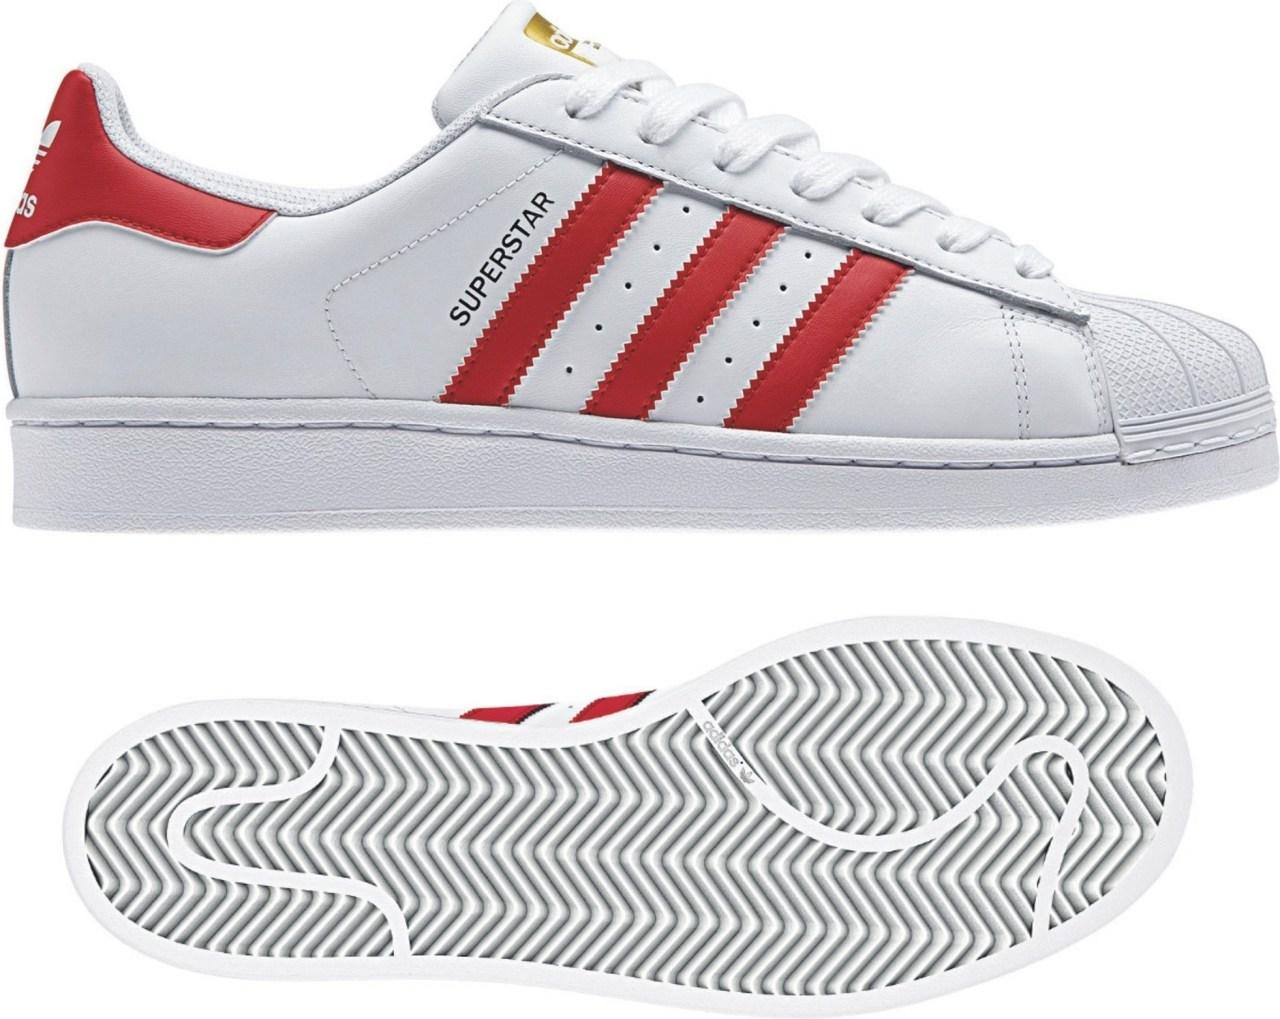 Adidas Superstar Foundation od 59 4052a07718a